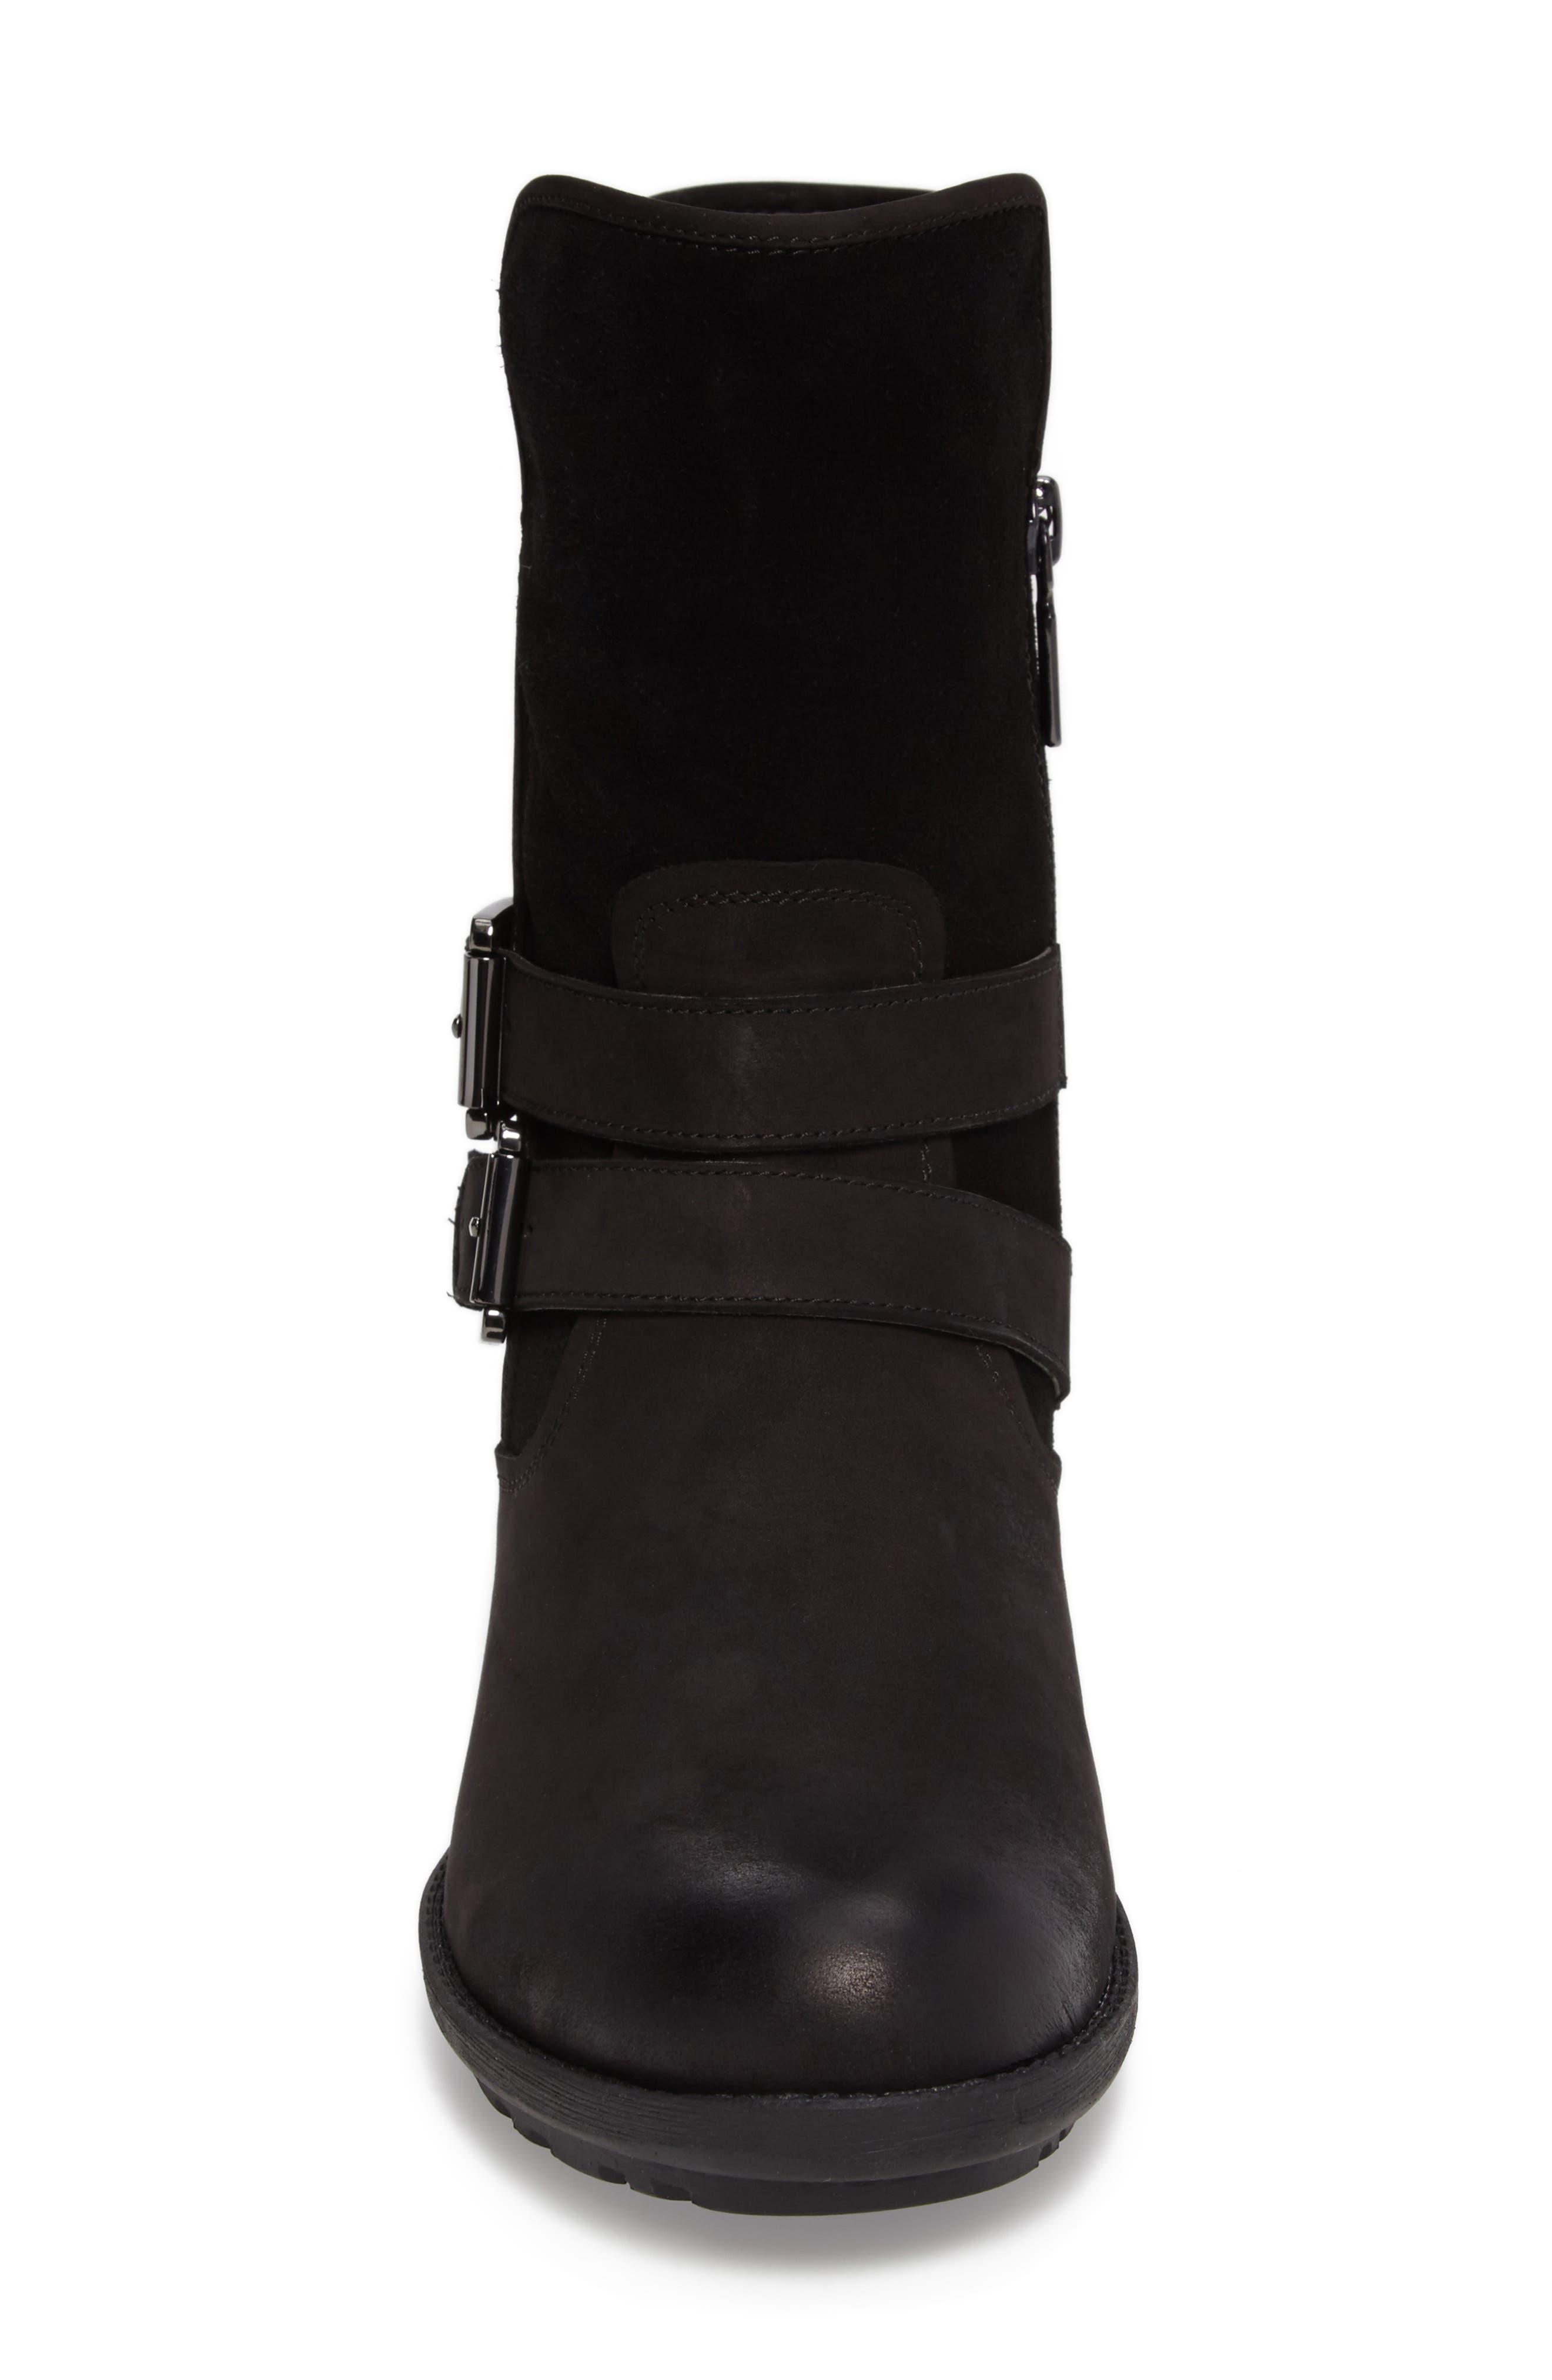 Tula Waterproof Boot,                             Alternate thumbnail 4, color,                             Black Nubuck Leather